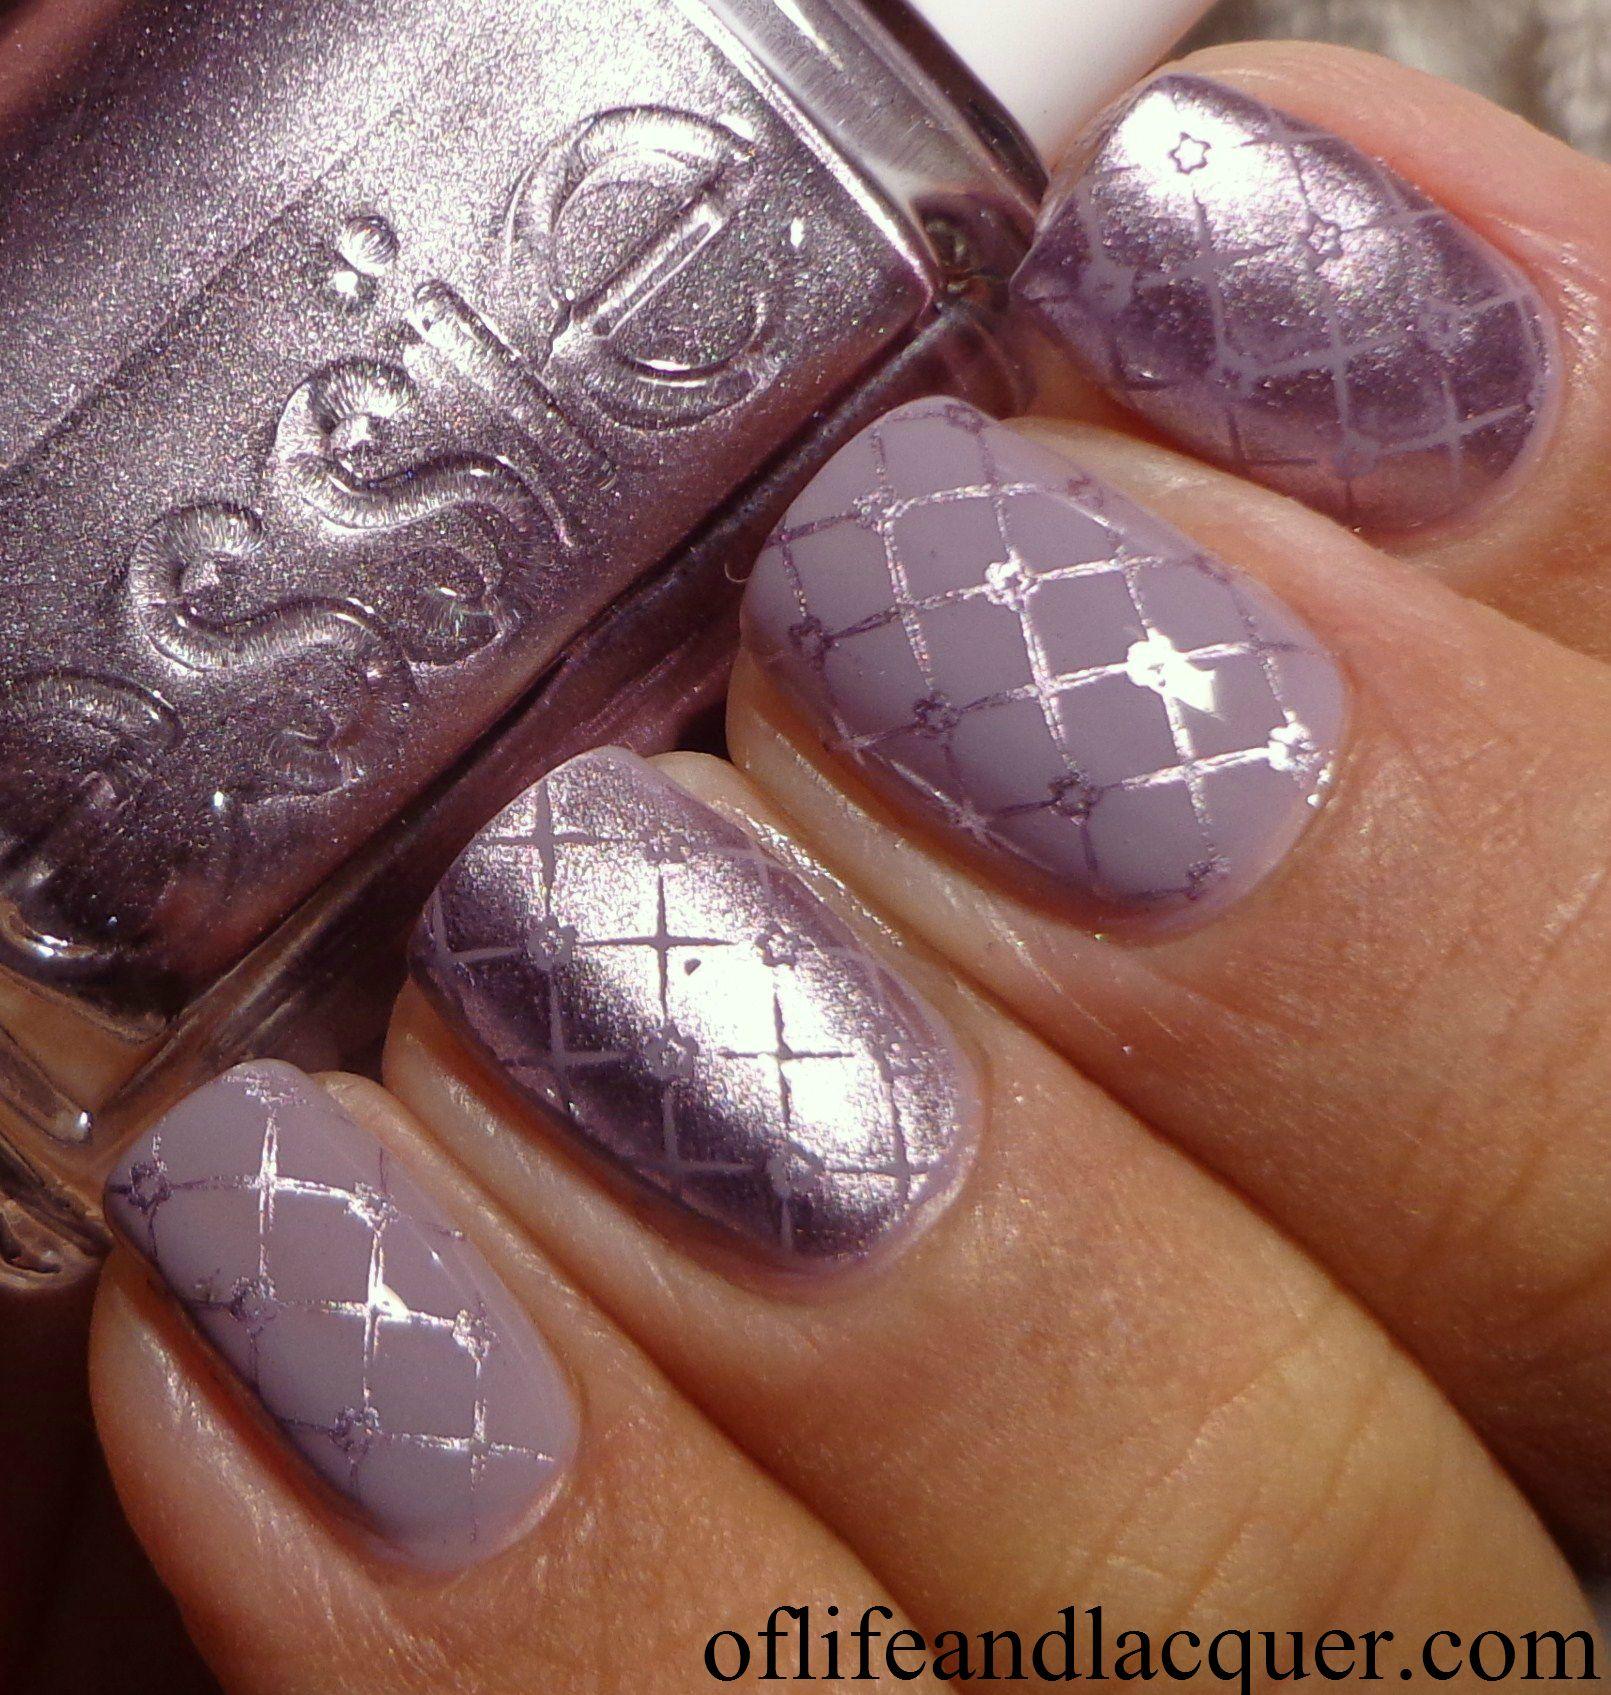 Simplenailarttips Stamping Nail Art Design Ideas Essie Nothing Else Metals Bm 310